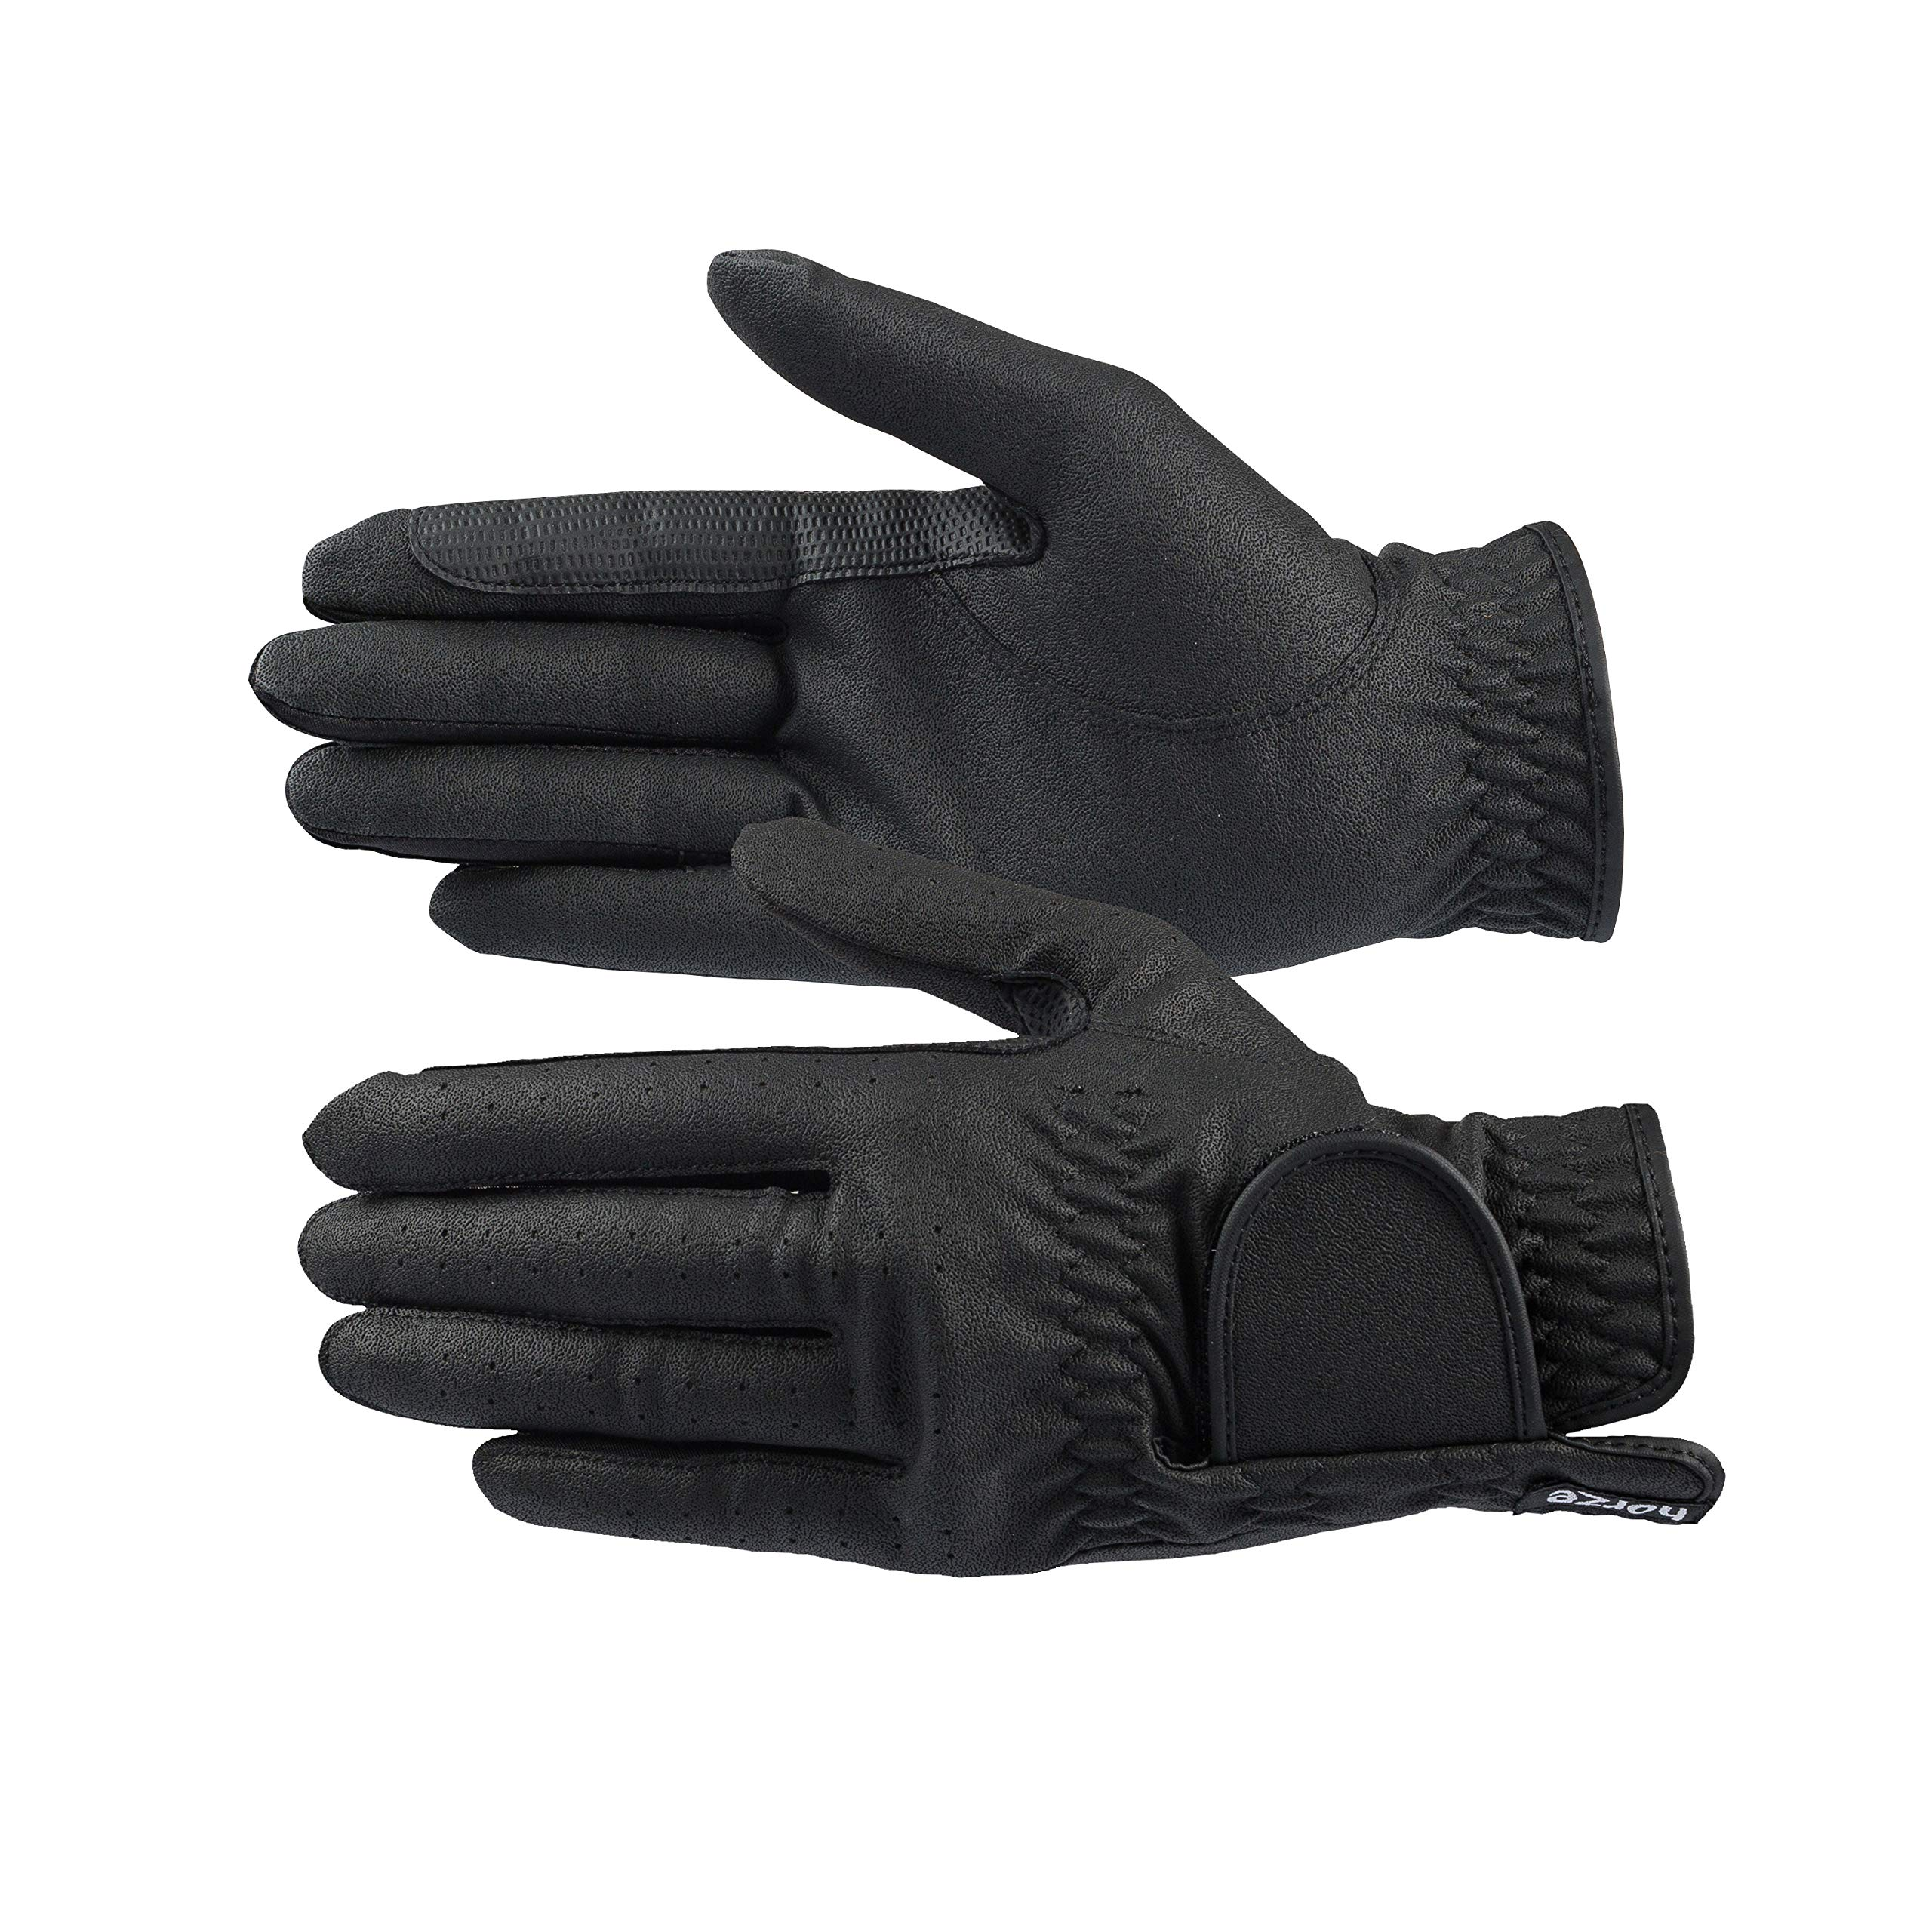 Horze Eleanor PU-Leather Gloves - Black - 7